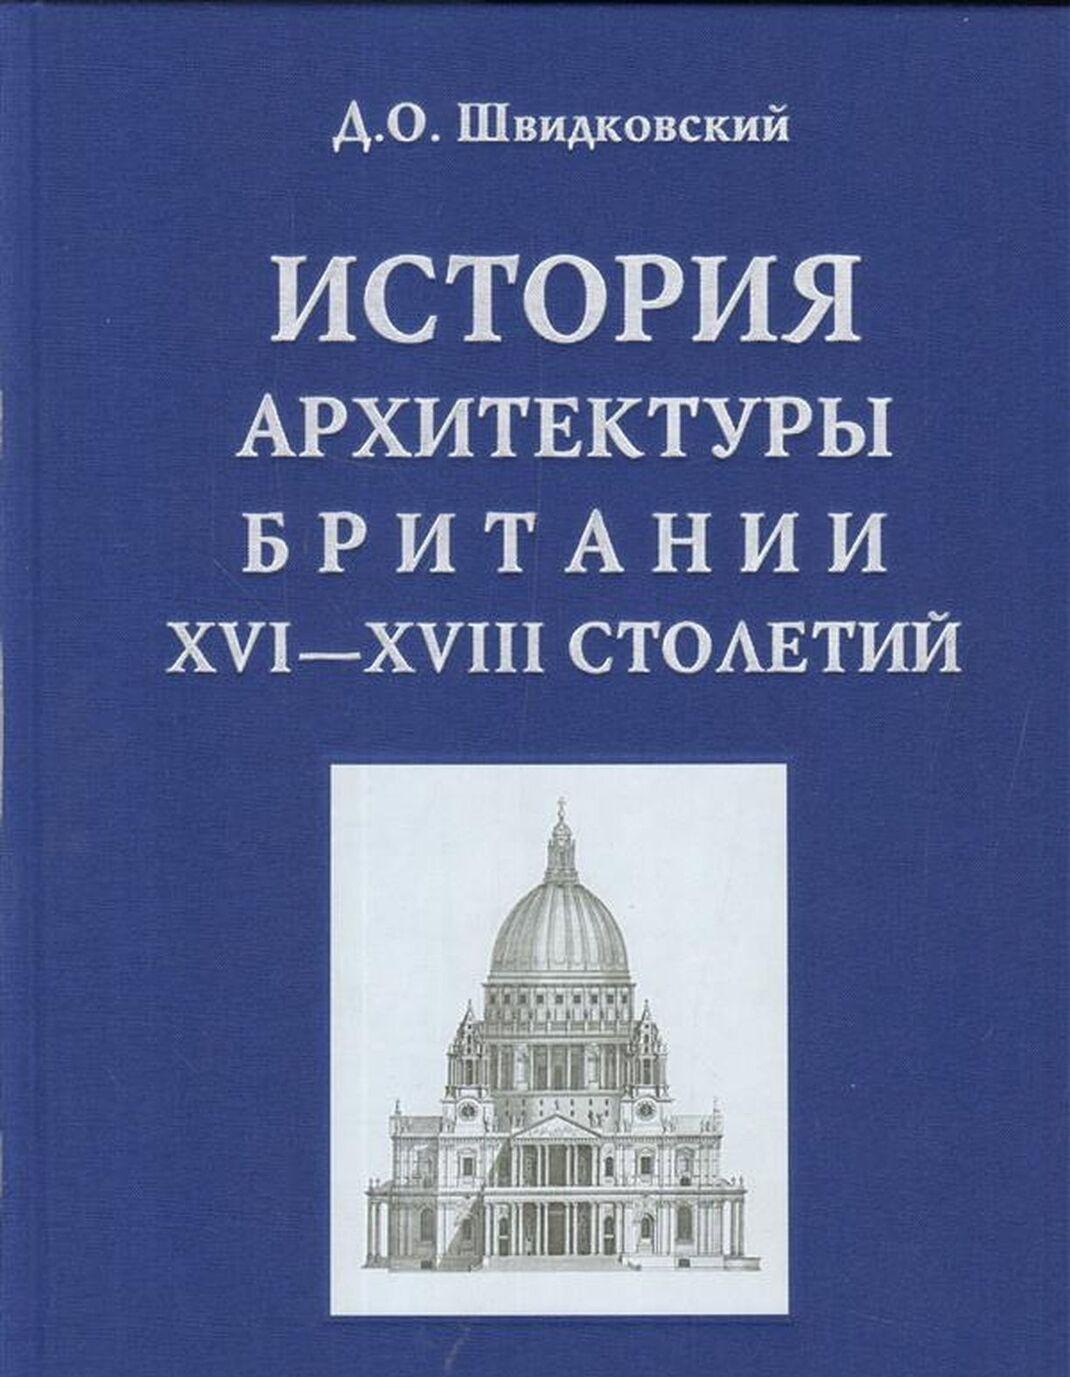 Istorija arkhitektury Britanii XVI-XVIII stoletij | Shvidkovskij Dmitrij Olegovich